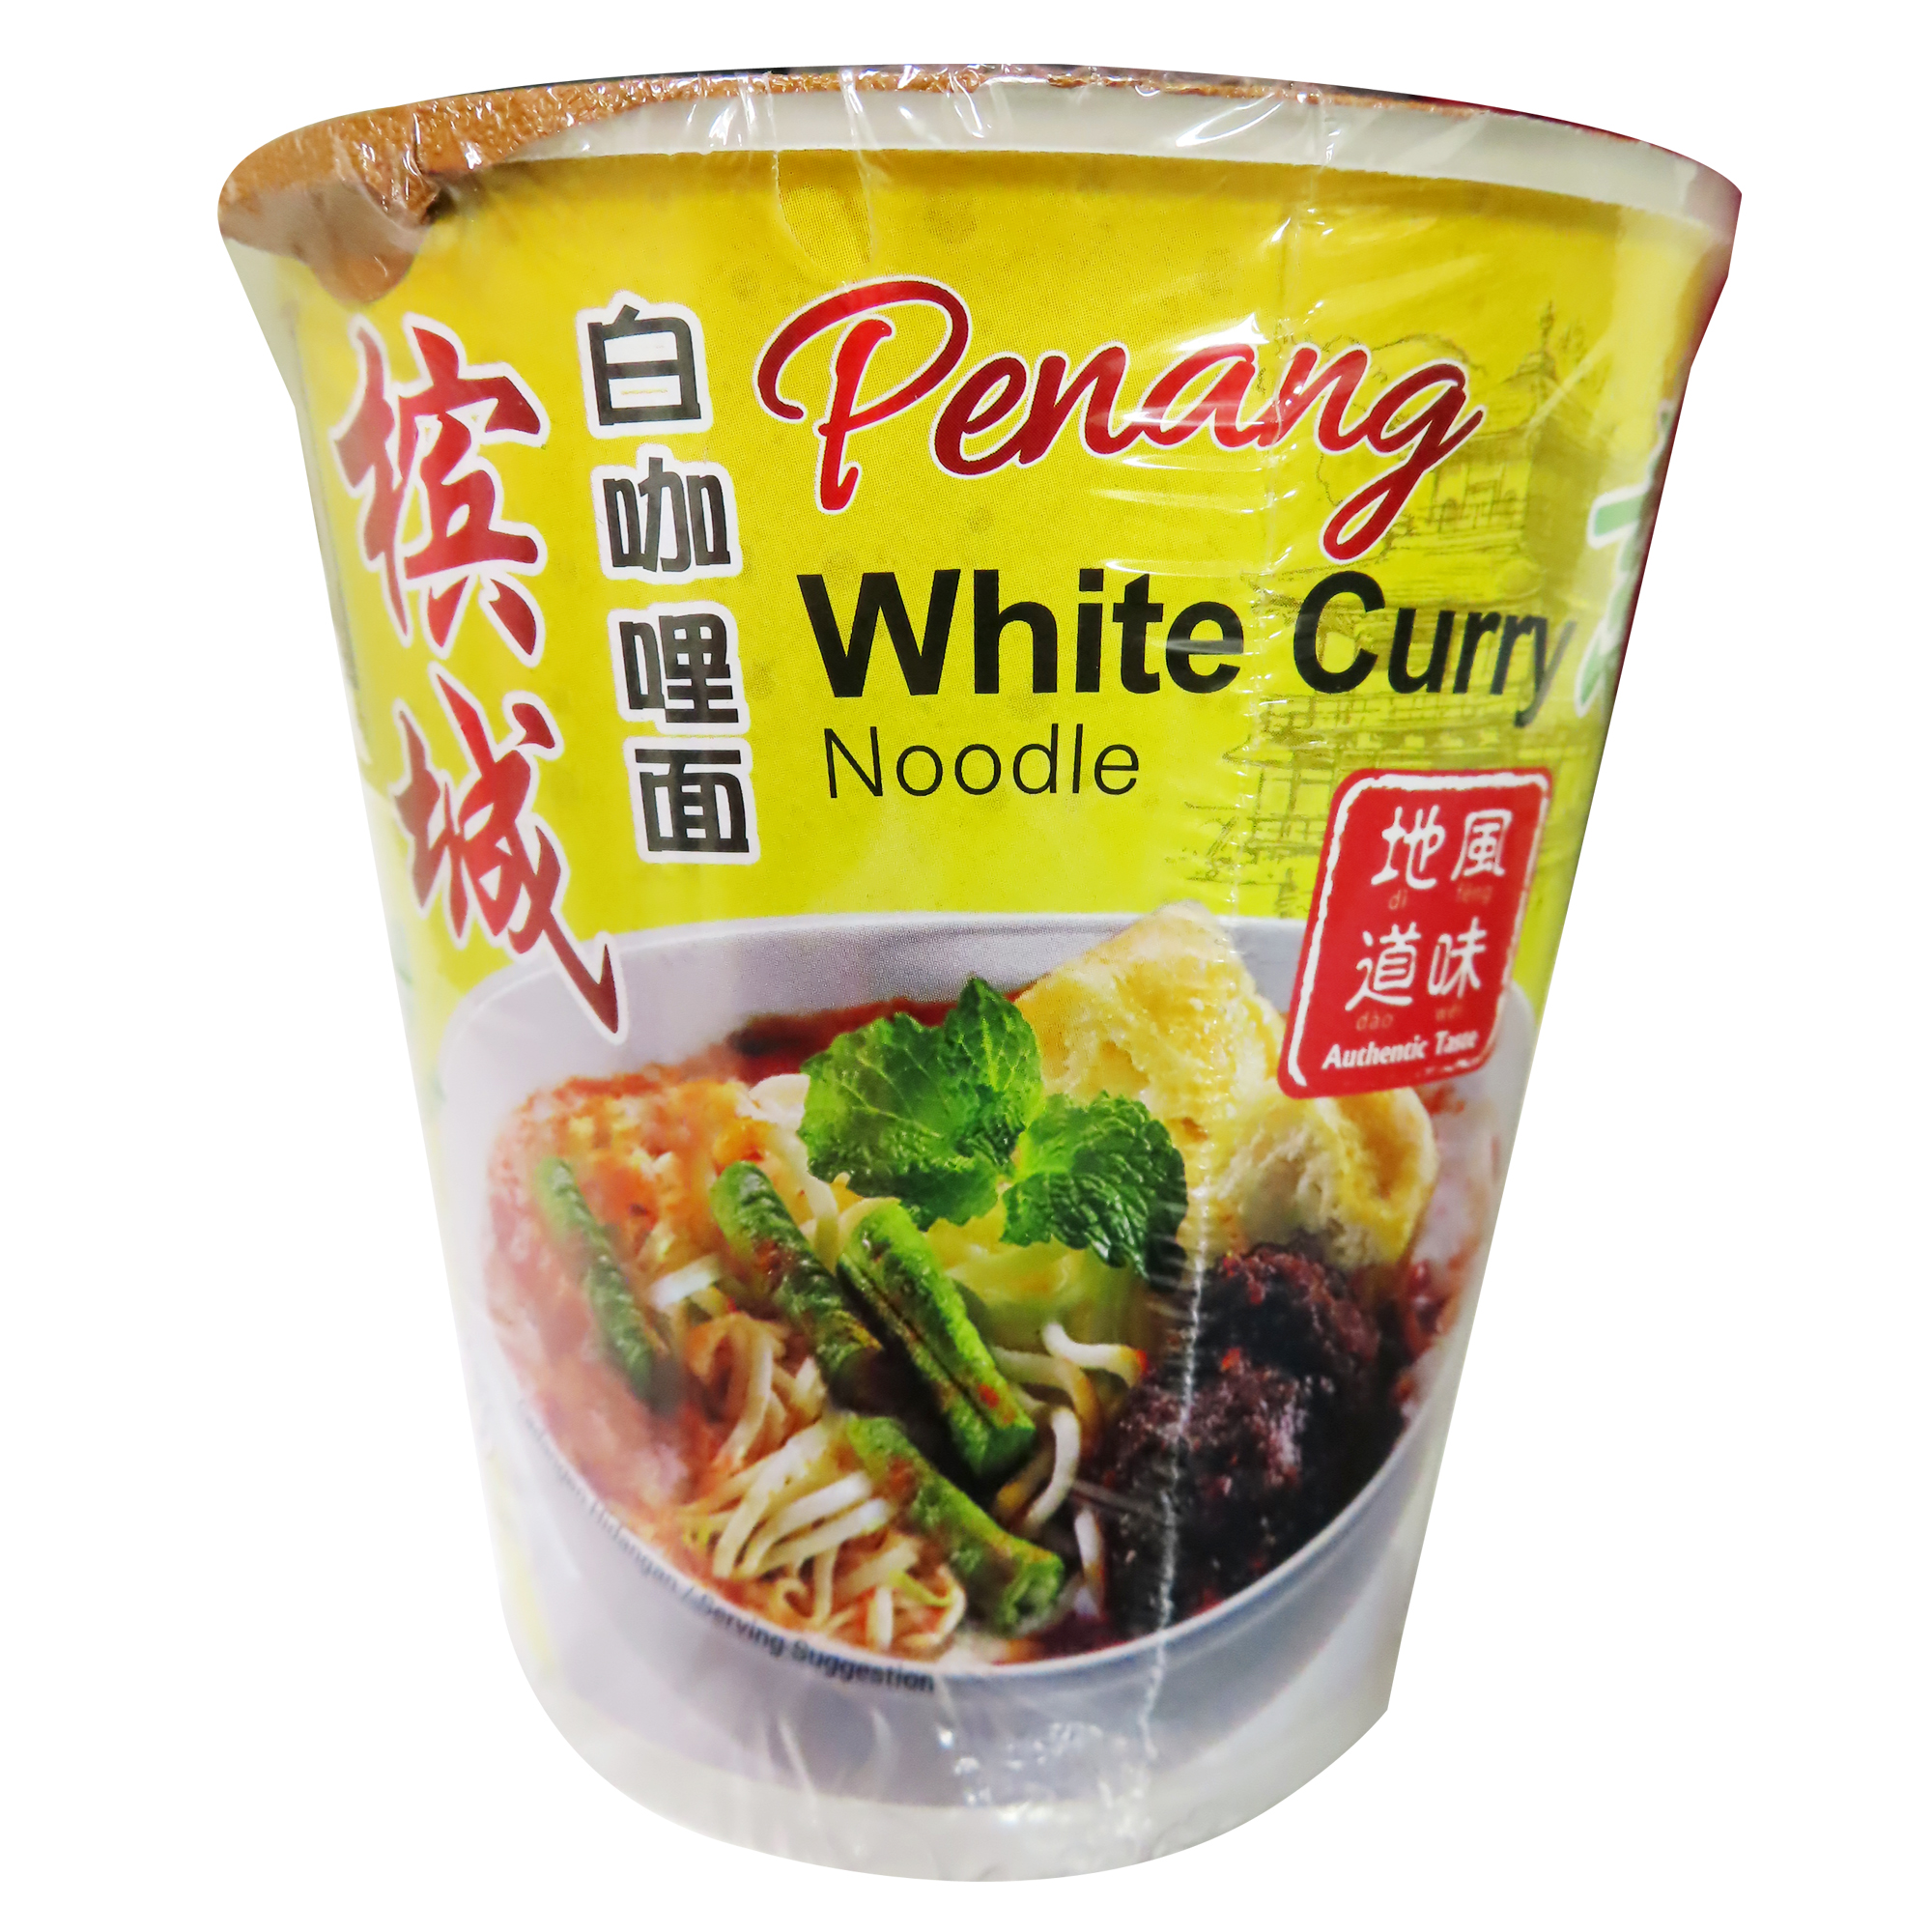 Image Penang White Curry 我锅丽 - 白咖哩杯面 85grams